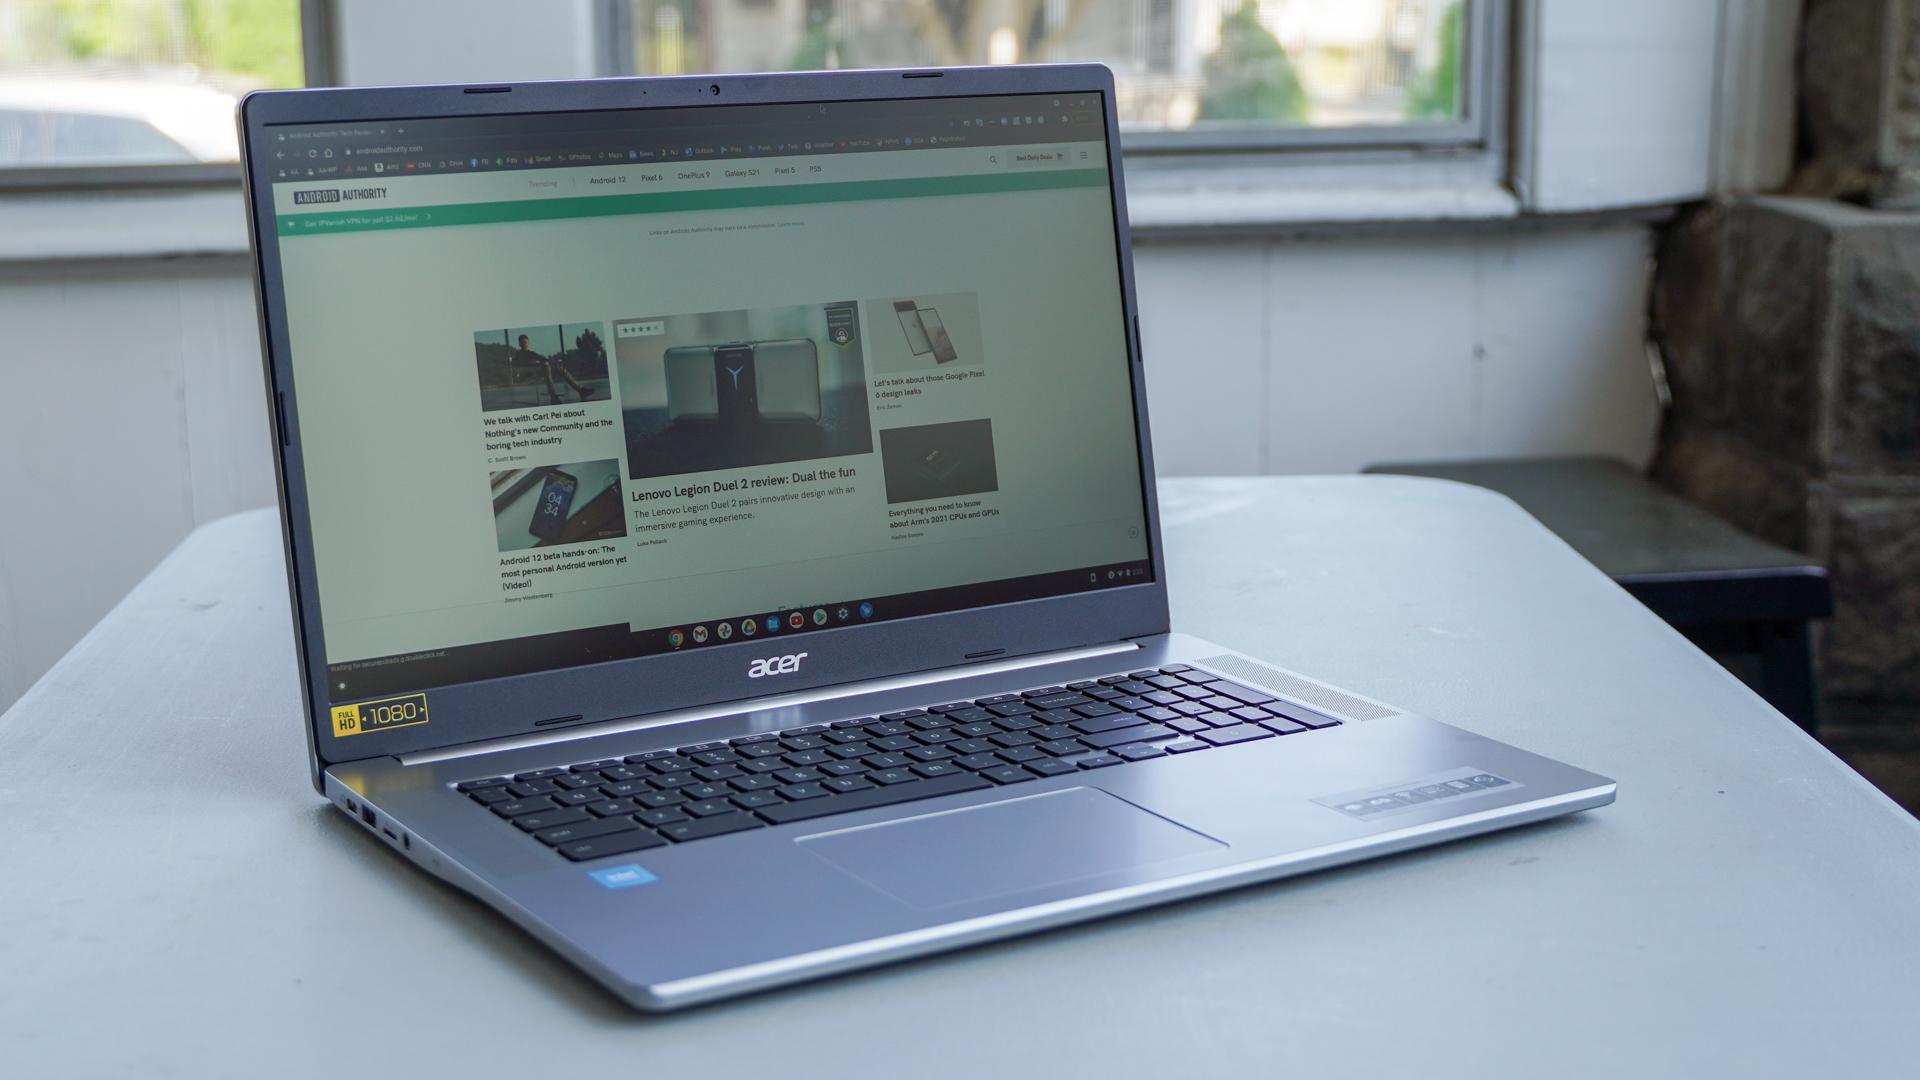 https://cdn57.androidauthority.net/wp-content/uploads/2021/05/Acer-Chromebook-317-left-profile.jpg